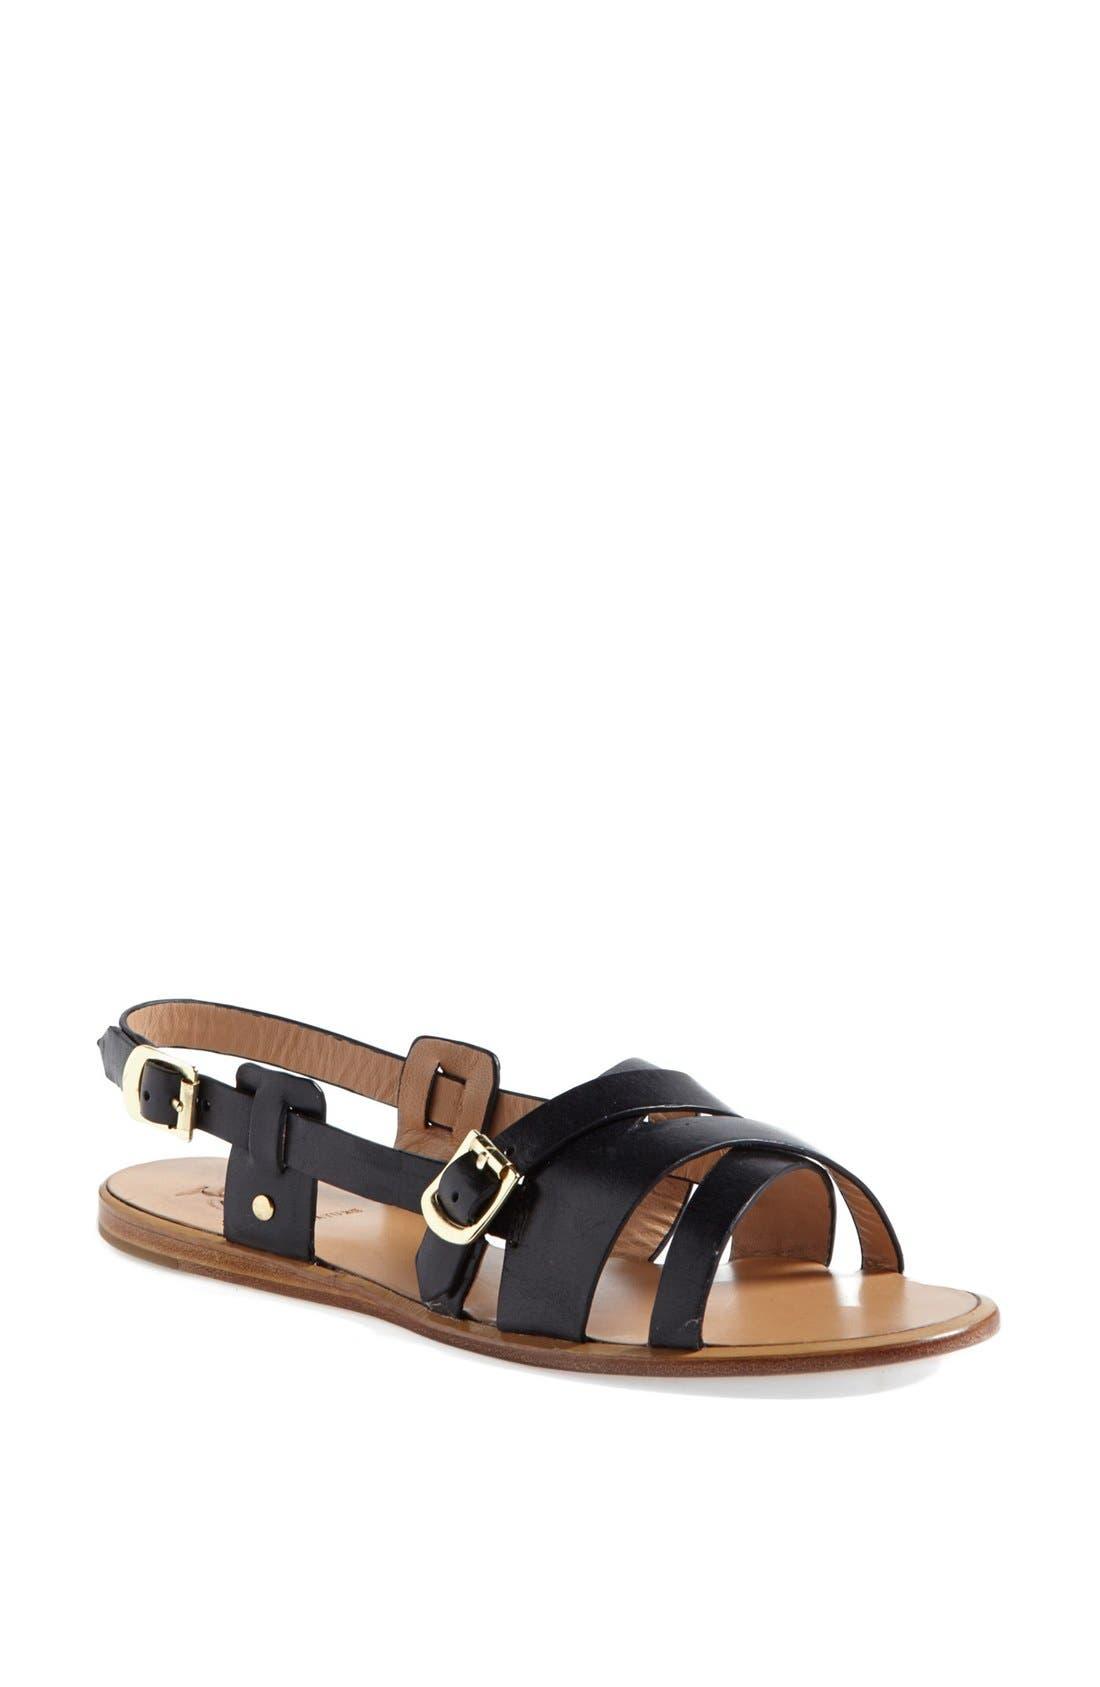 Alternate Image 1 Selected - VC Signature 'Sharlena' Slingback Sandal